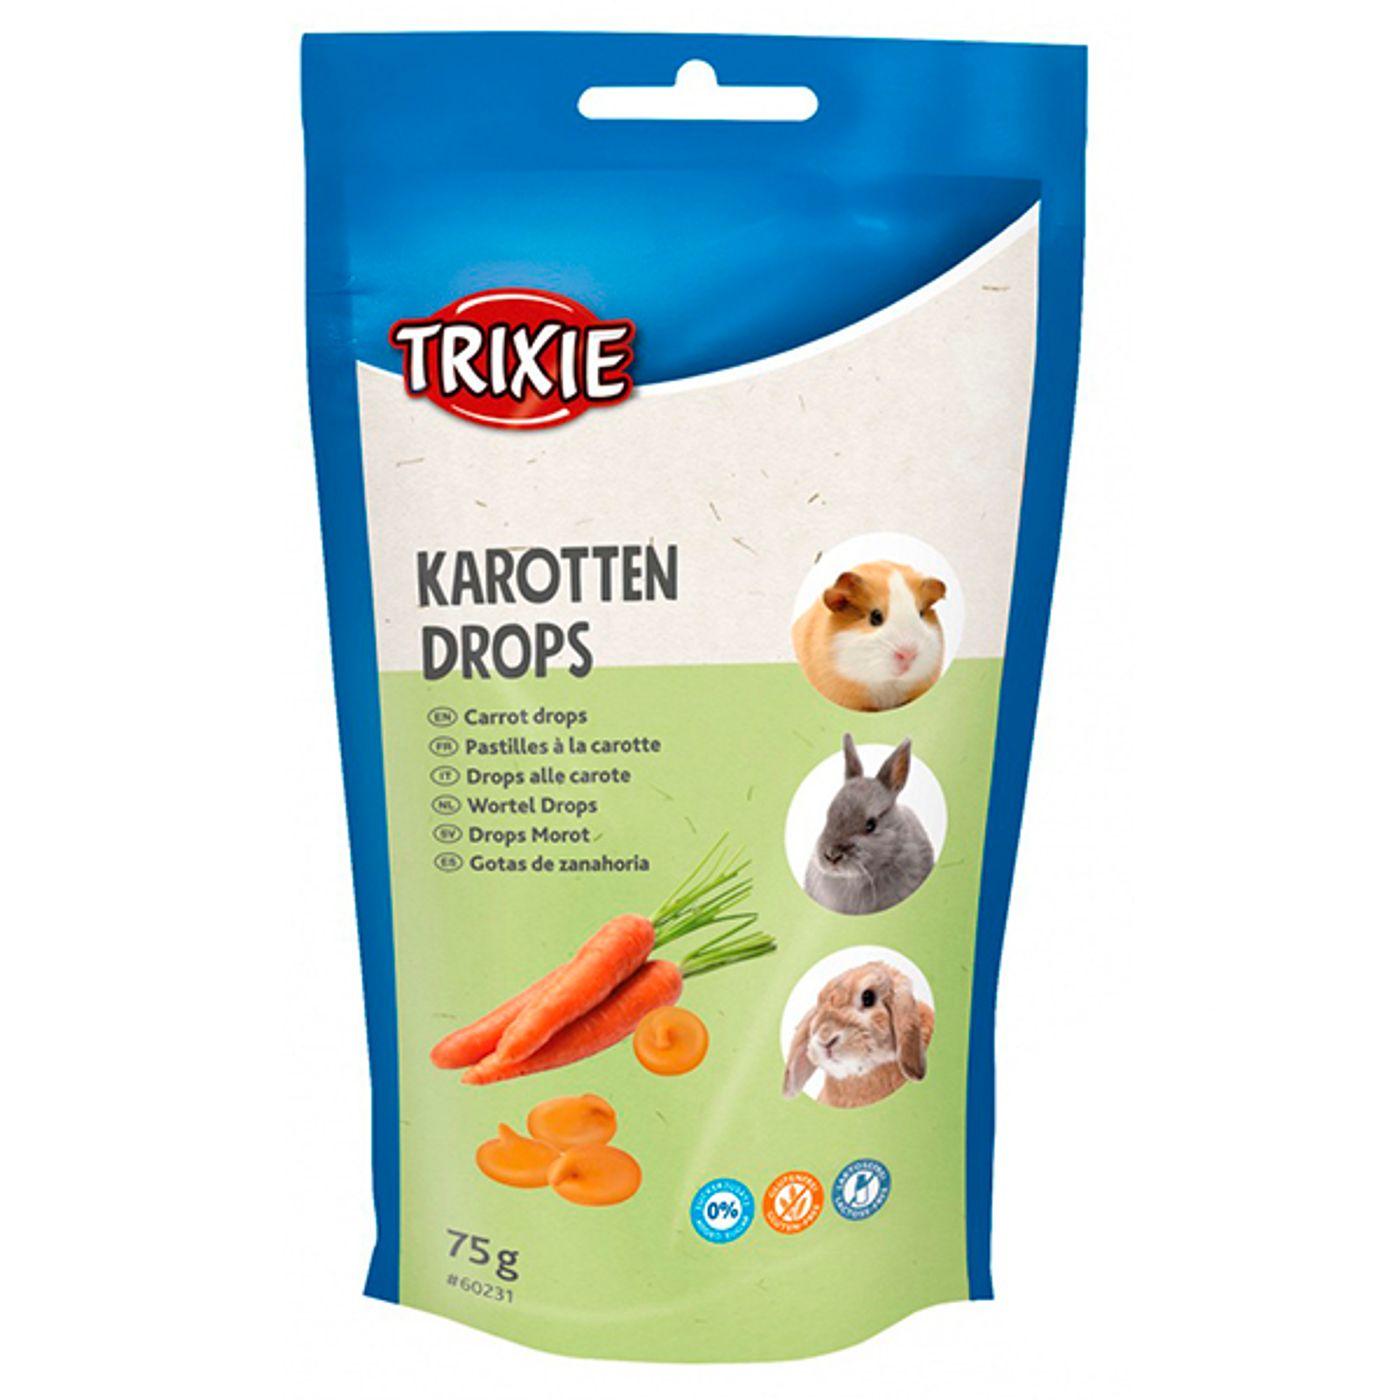 Trixie-bombons-vitaminicos-com-cenouras-para-roedores